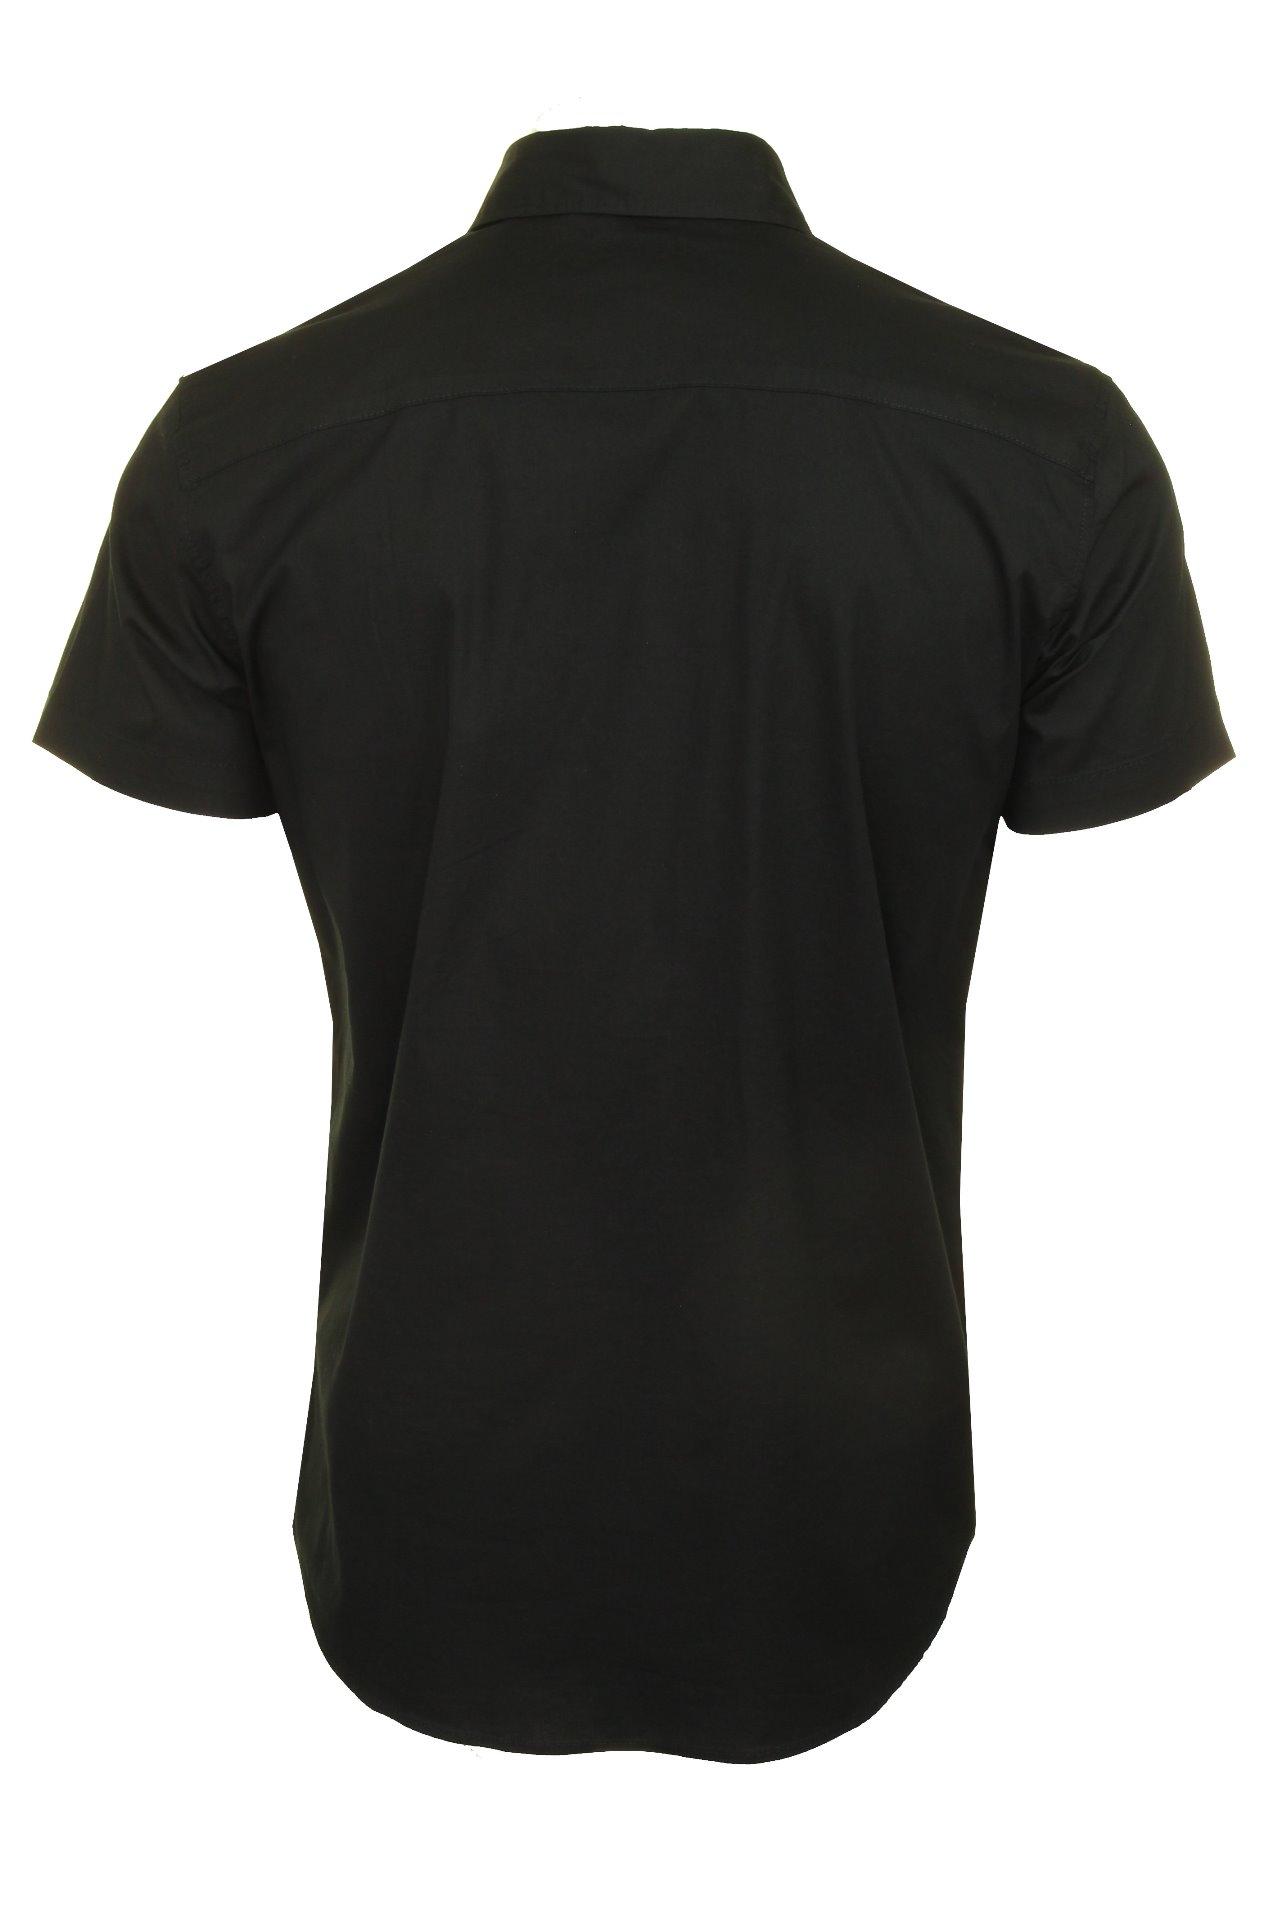 Jack-amp-Jones-Mens-039-Clint-039-Poplin-Shirt-Short-Sleeved thumbnail 5